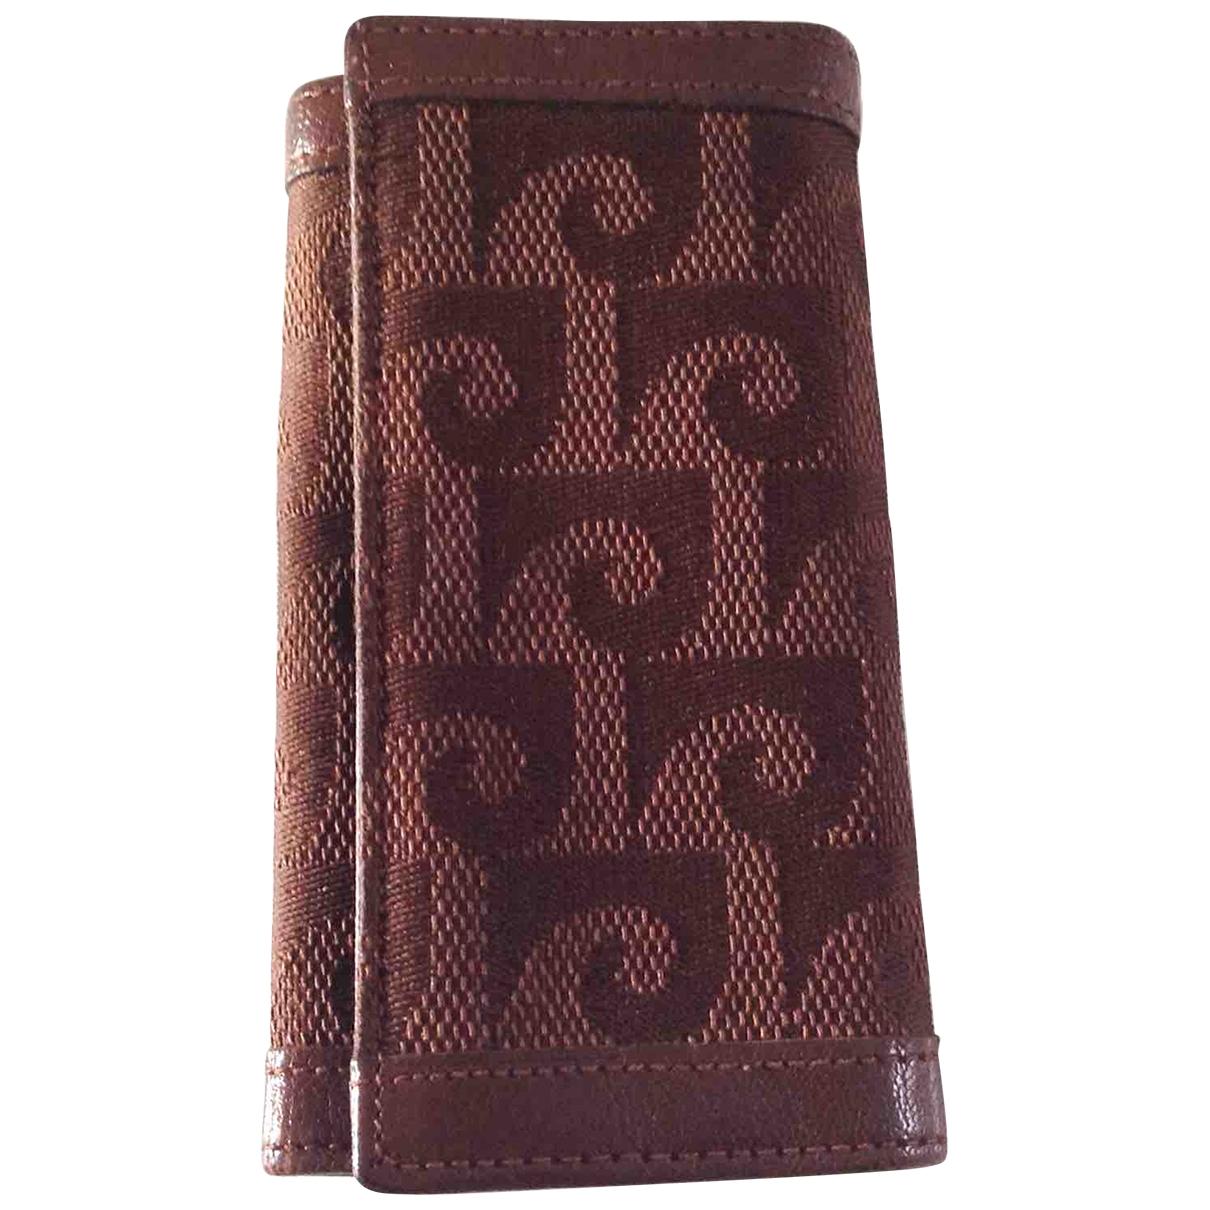 Pierre Cardin \N Brown Cloth Purses, wallet & cases for Women \N